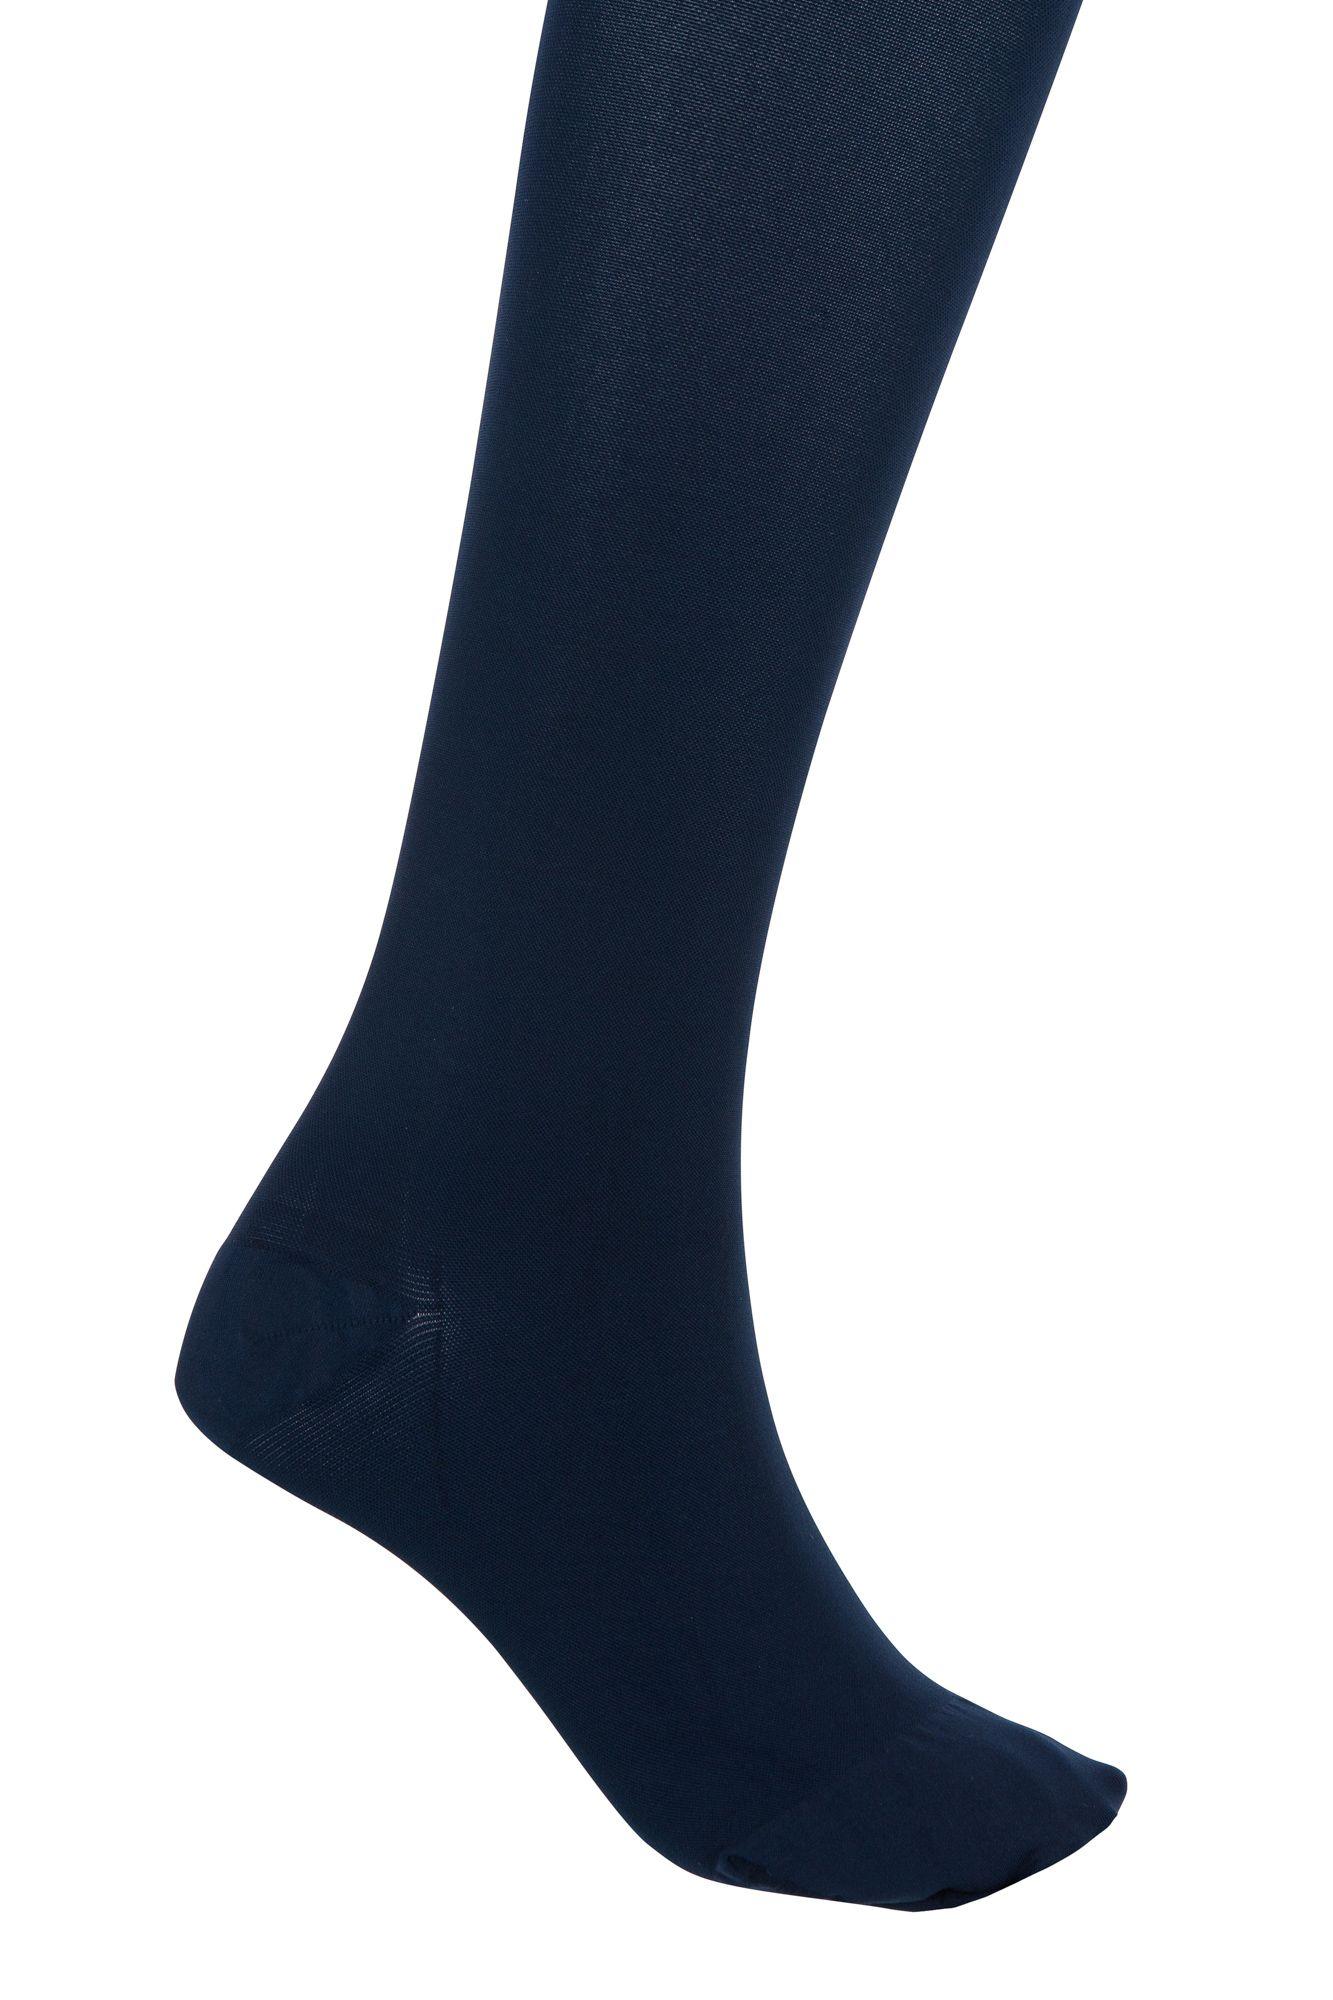 da9eedbbf JOBST® Opaque Class 1 Below Knee Compression Stockings - Daylong